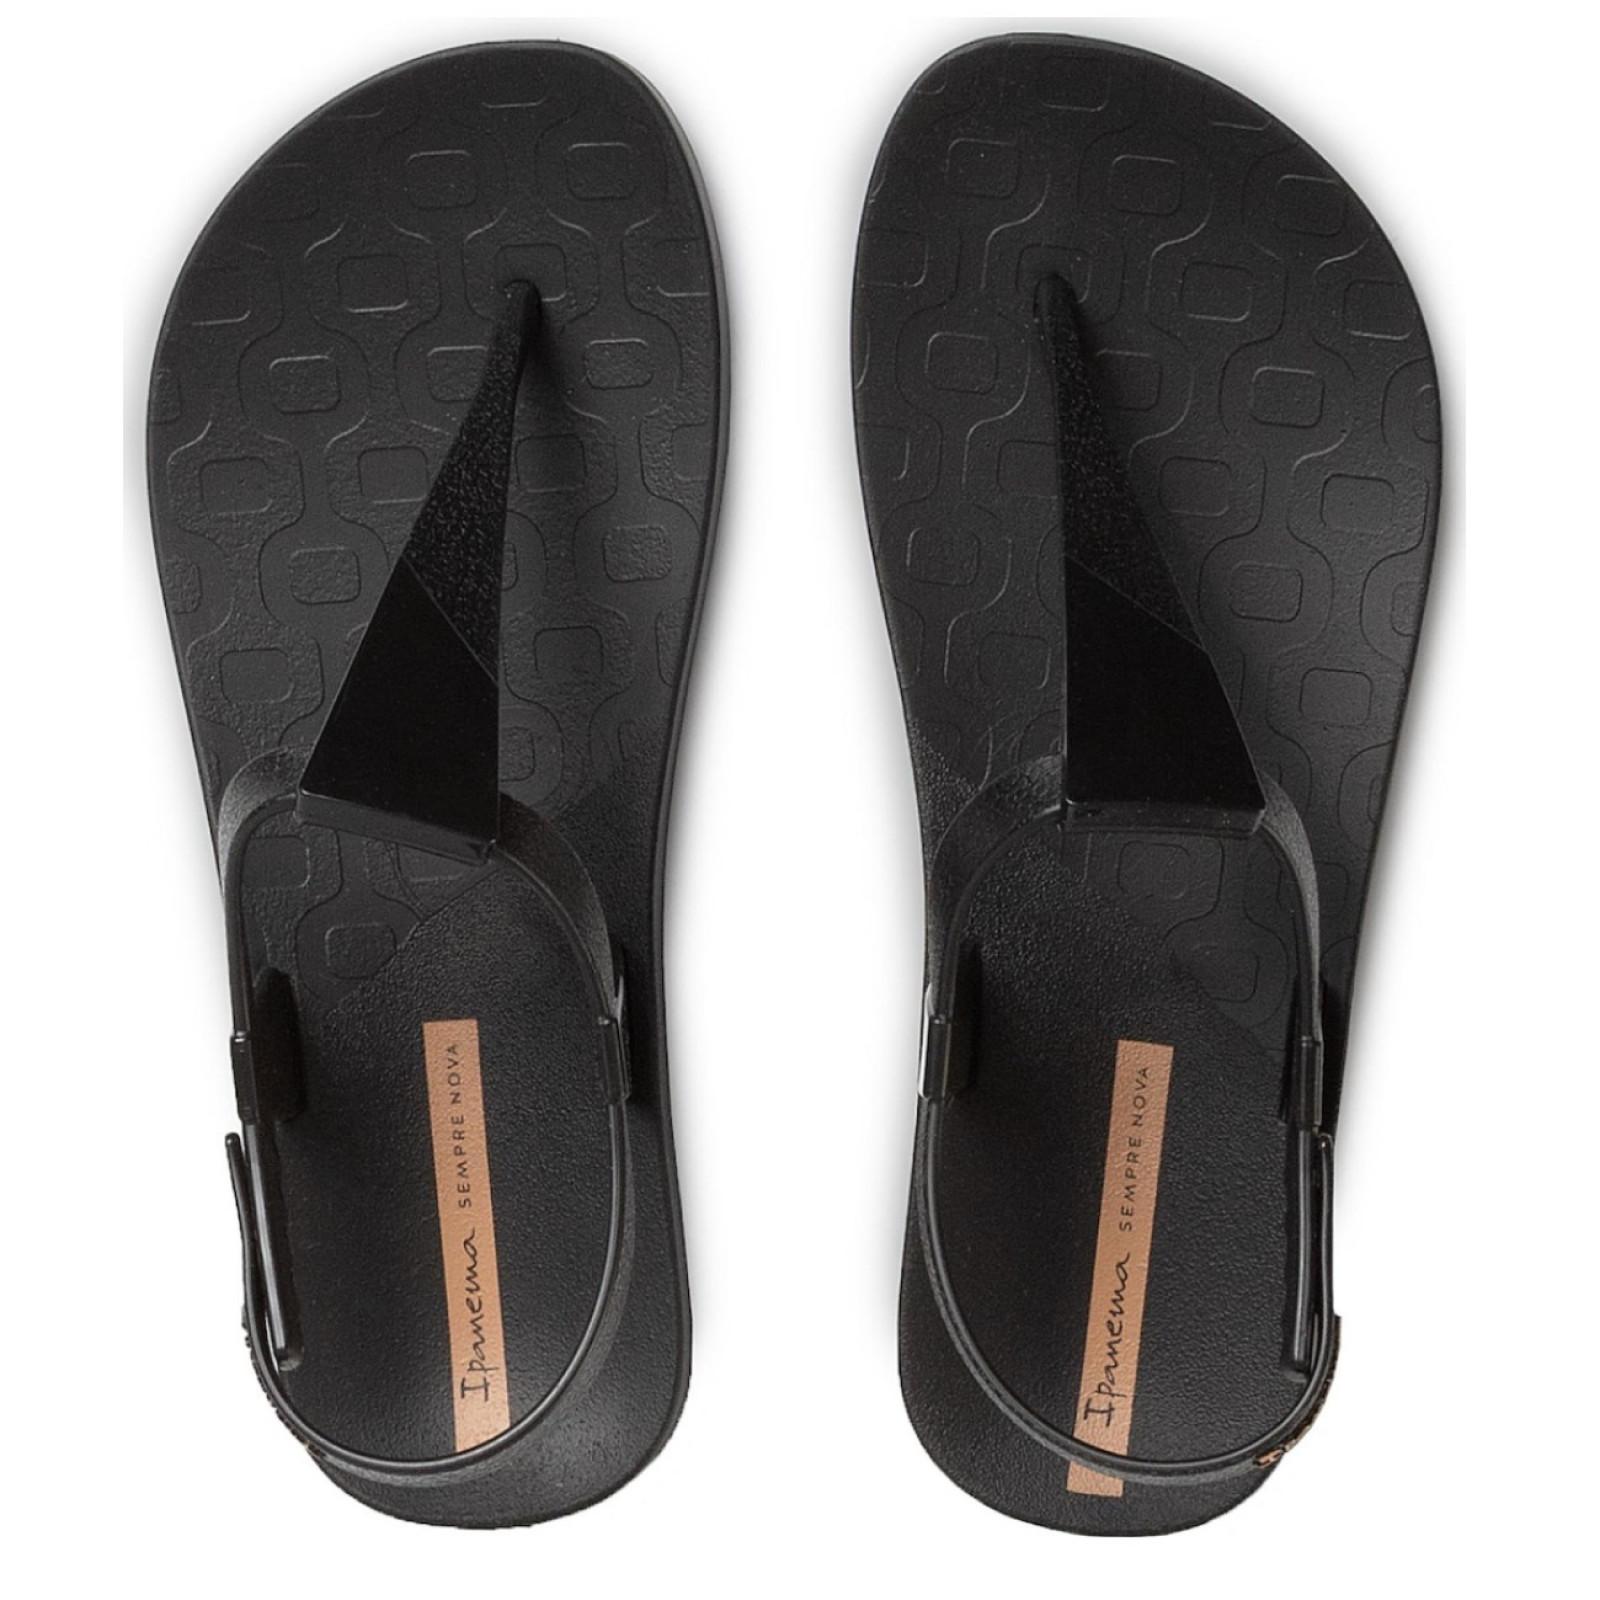 Ipanema Sensation Sandal Fem 780-20380 Black/Black (83055-20766)